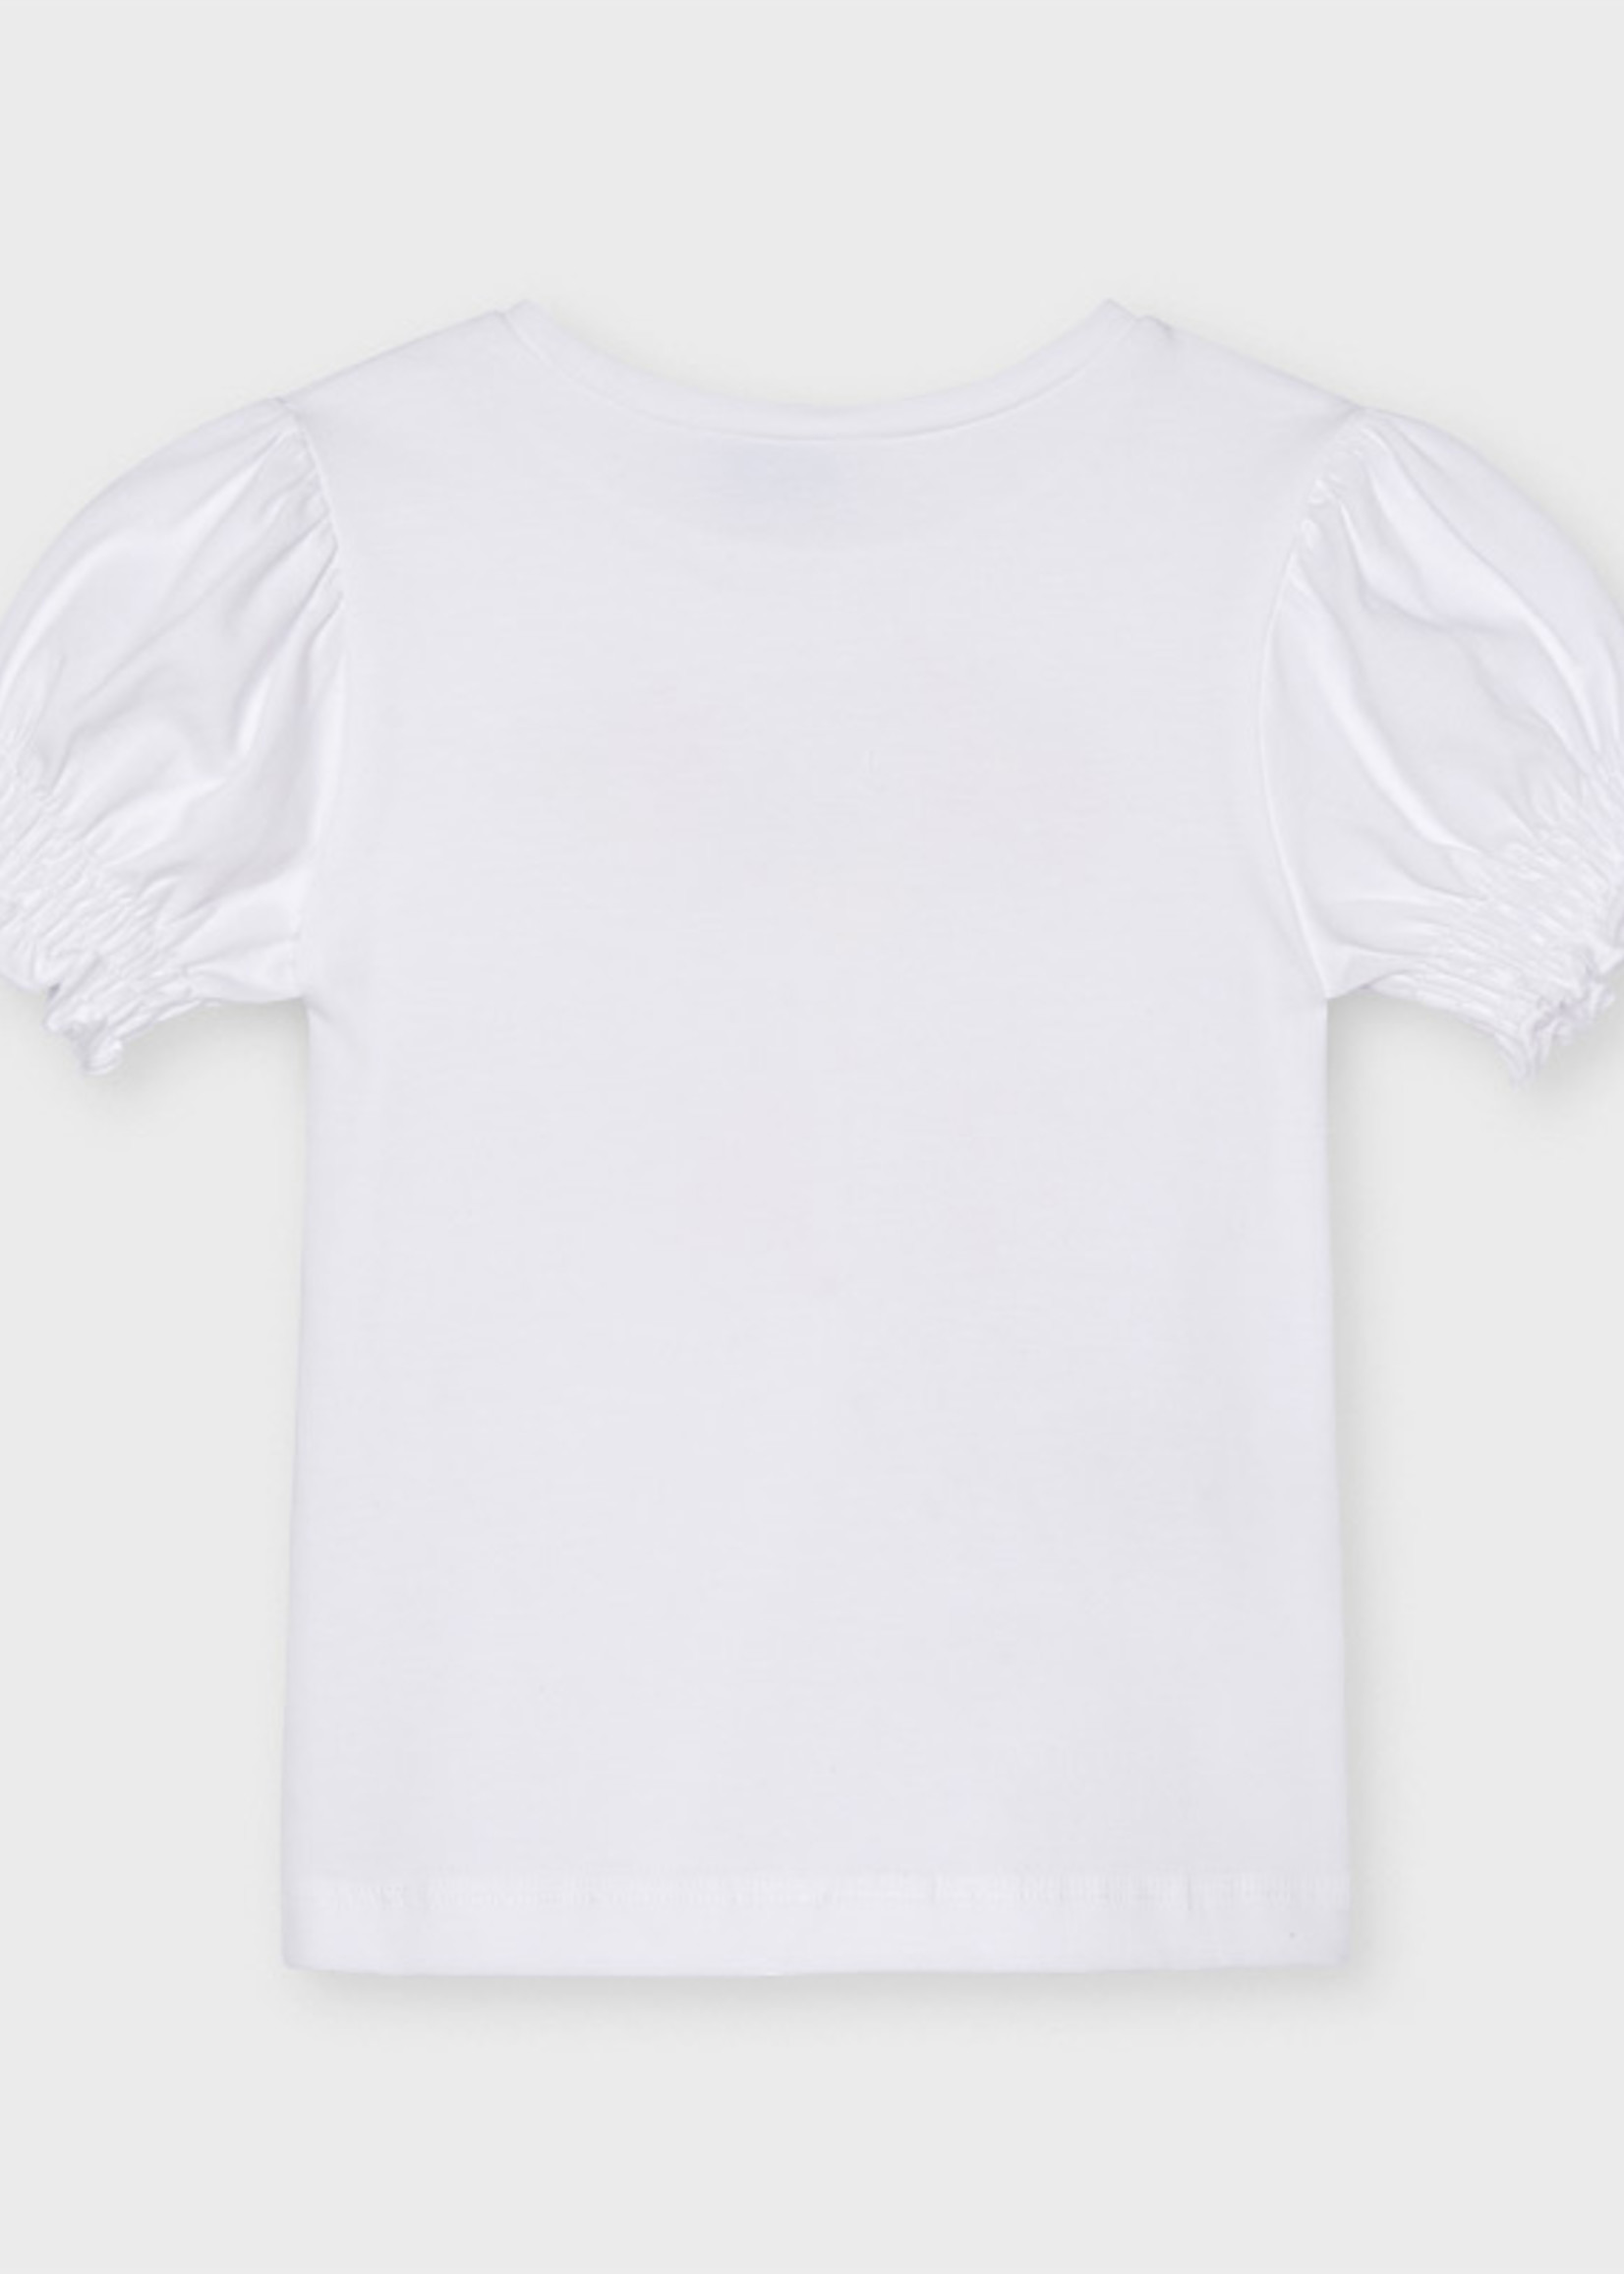 Mayoral Mayoral ciao girls shirt